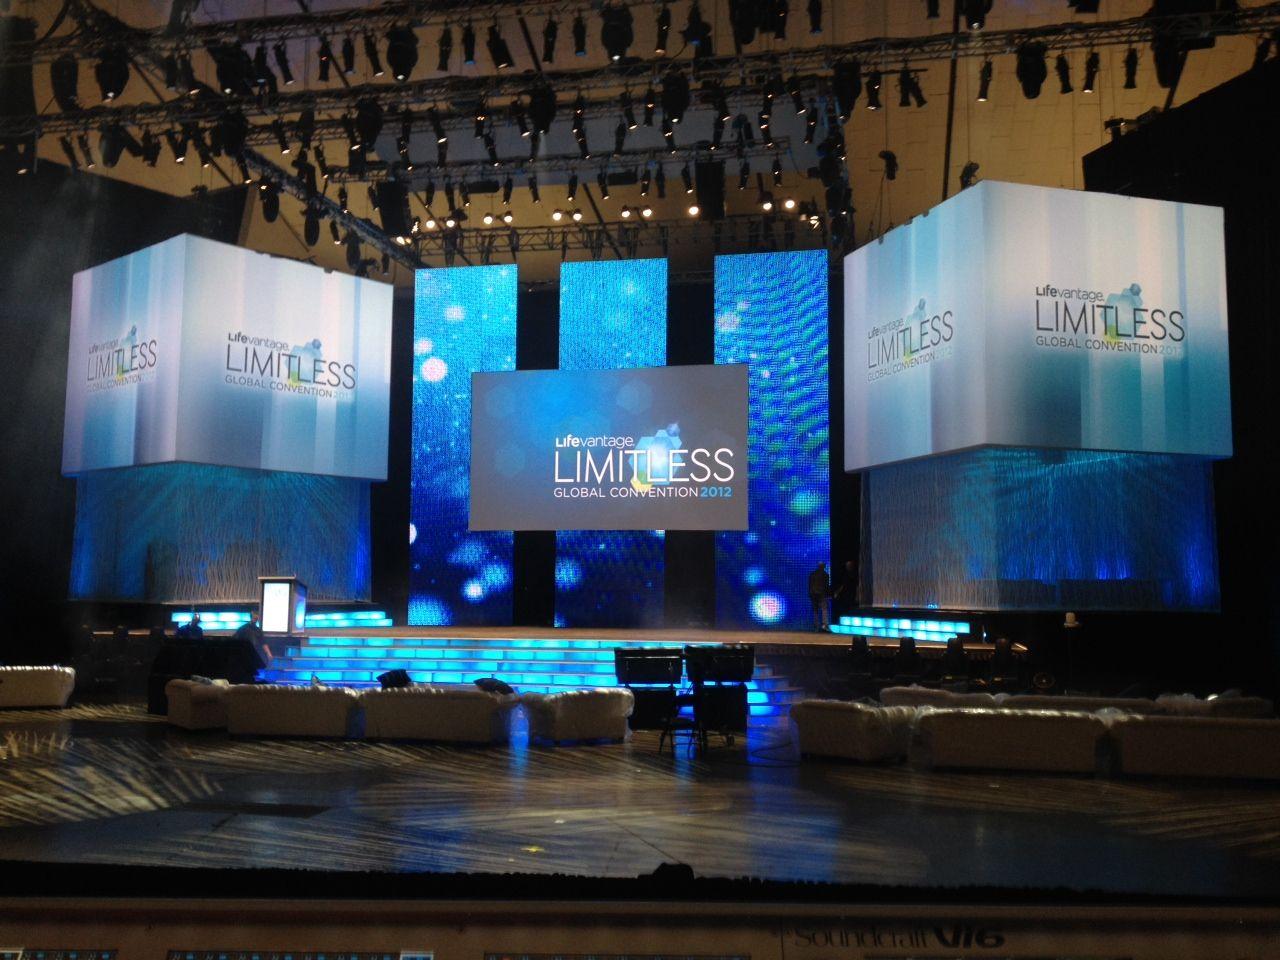 Life Vantage Global Conference in Anaheim Ca LifeVantage 1280x960